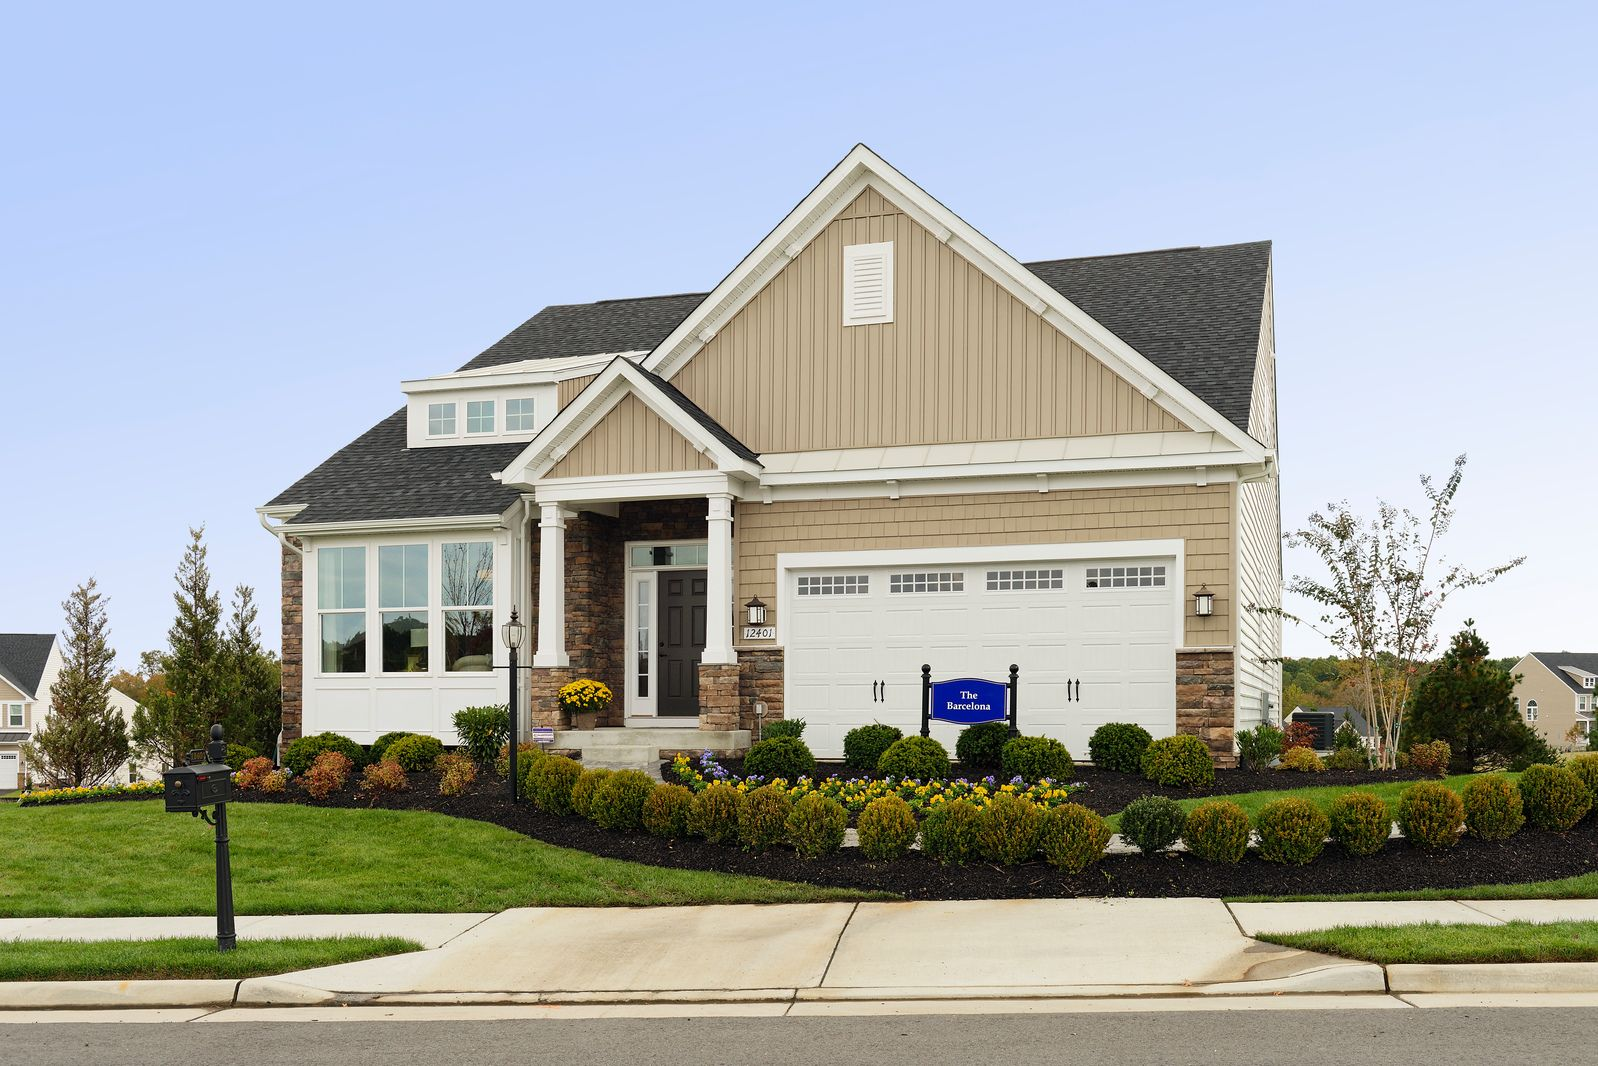 Single Family for Sale at May's Quarter - Barcelona - Main Level Living 12420 May's Quarter Road Lake Ridge, Virginia 22192 United States